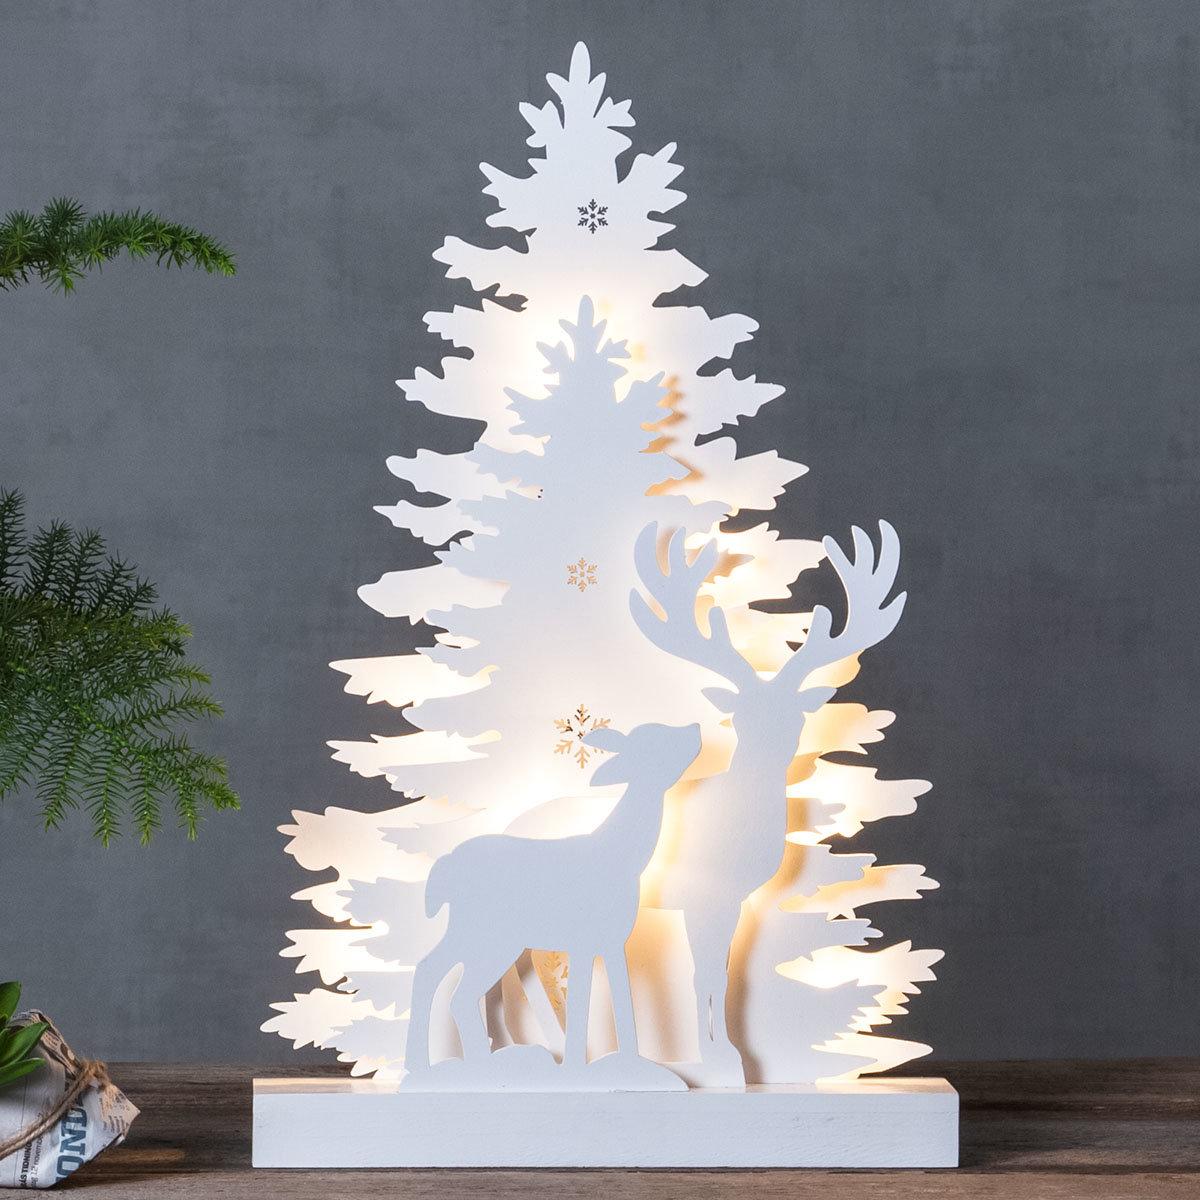 LED-Fensterleuchter Winter Emotion, 44x28x6 cm, Holz, weiß